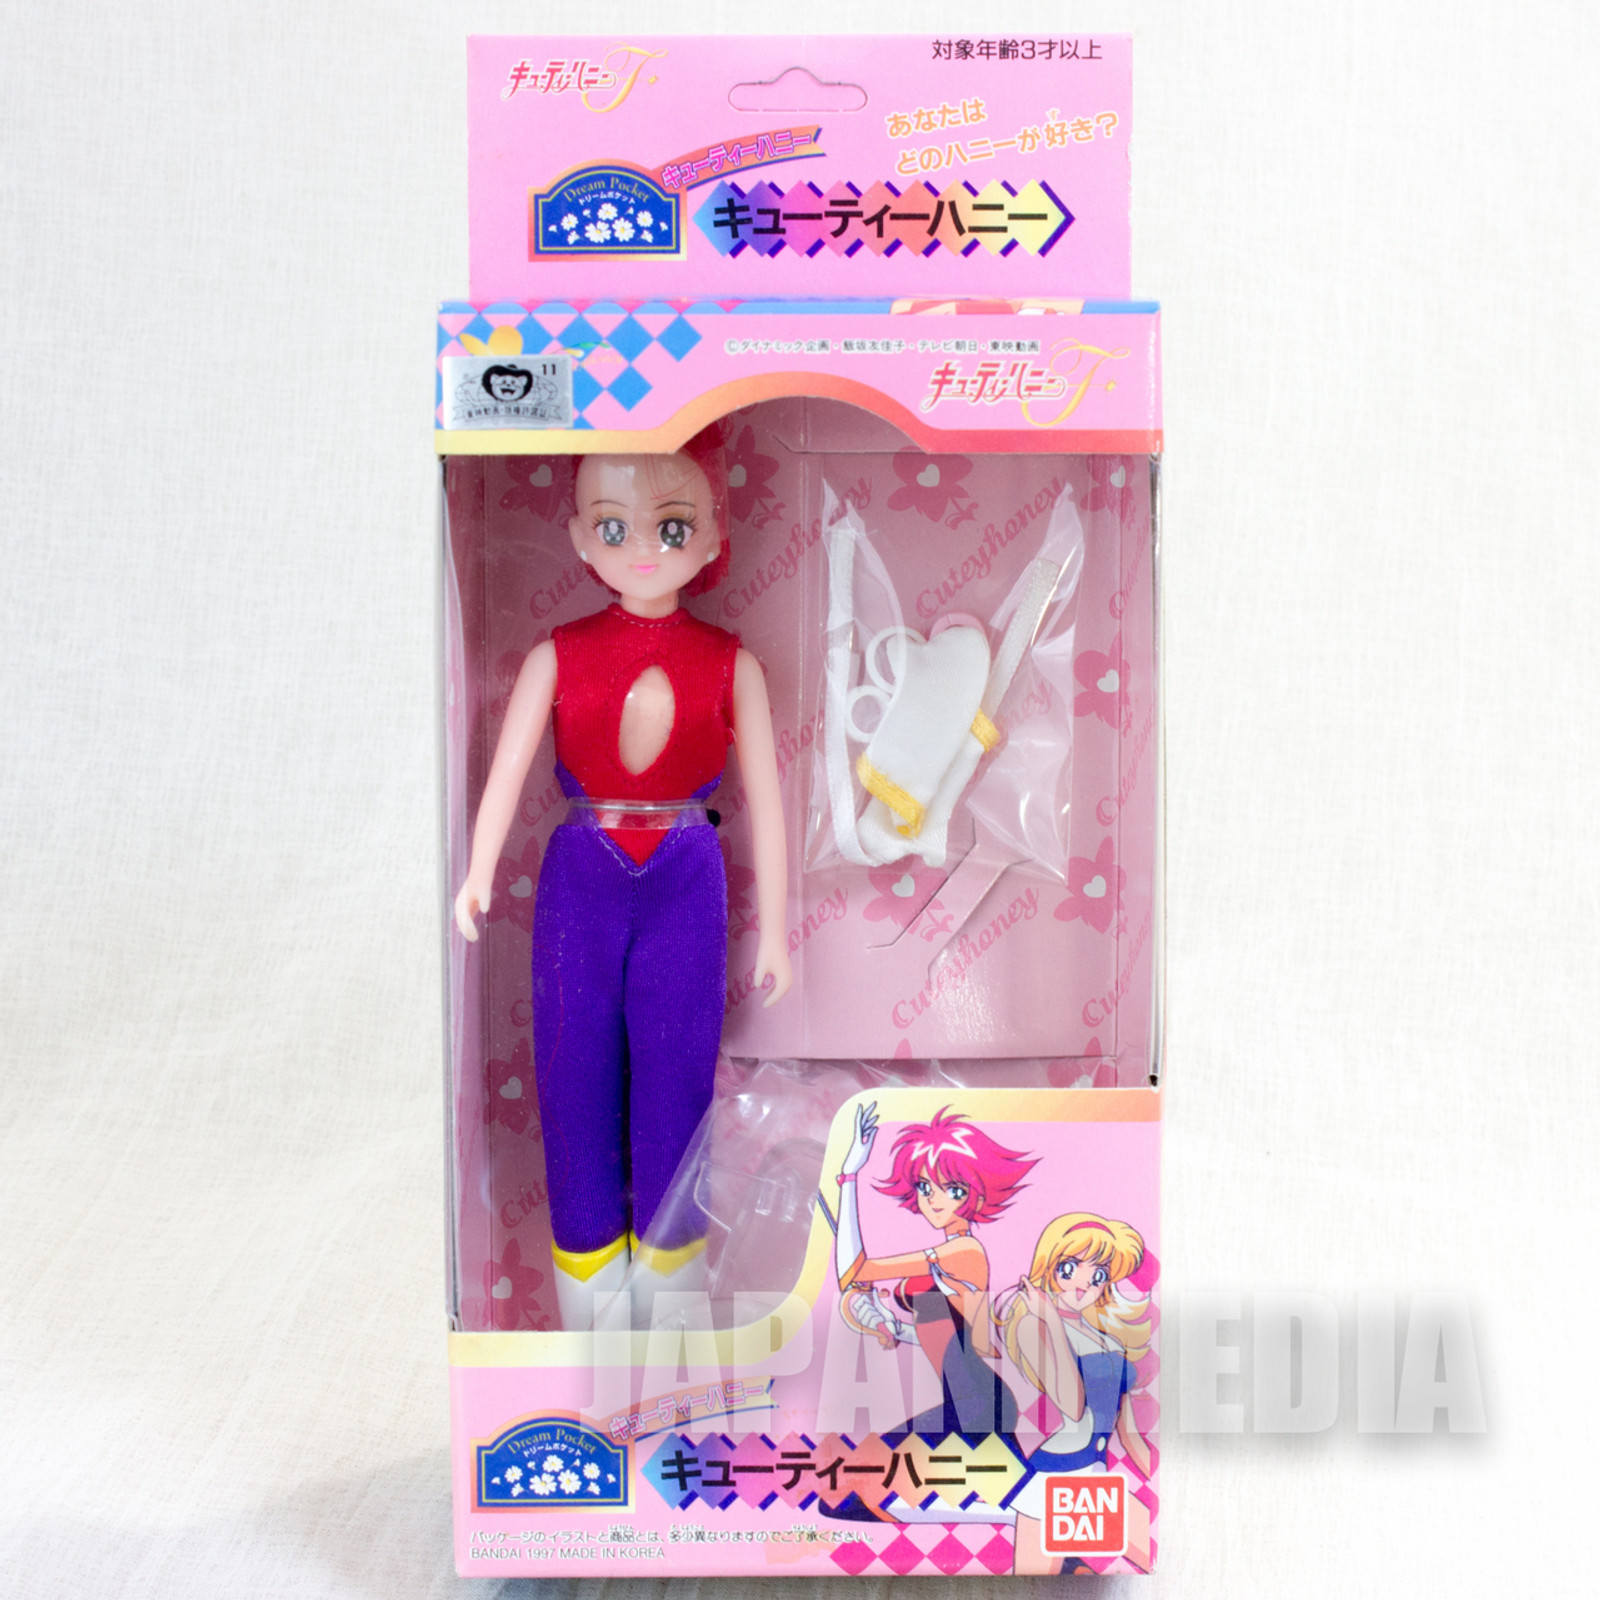 Cutie Honey Doll Figure Normal ver. Dream Pocket BANDAI JAPAN ANIME MANGA